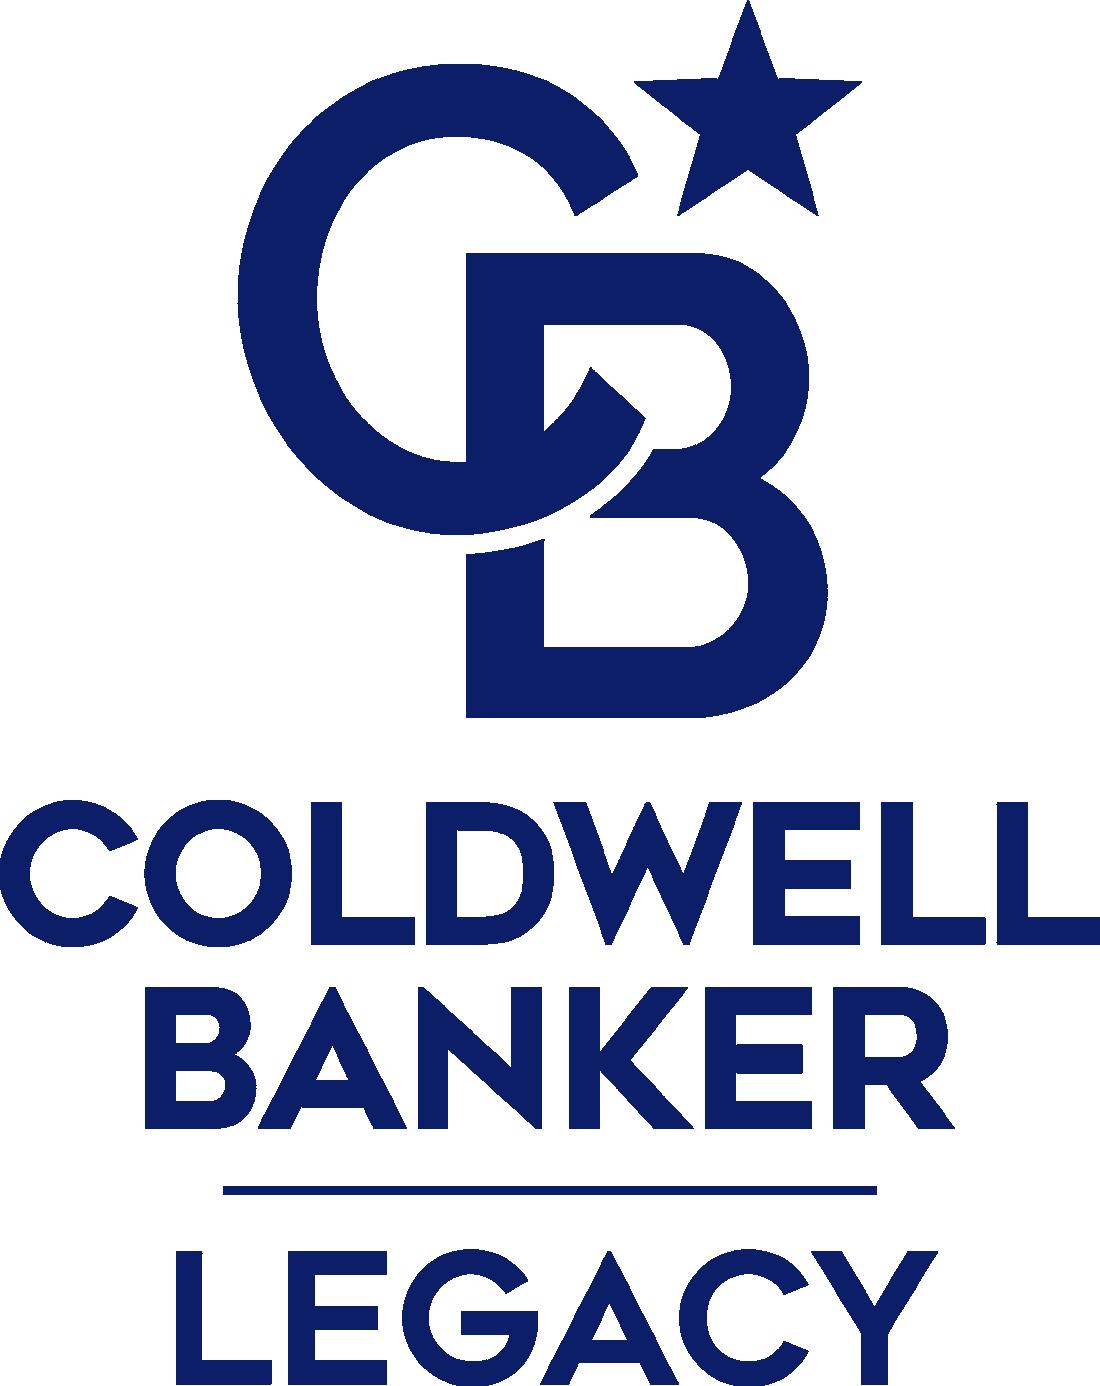 Scott Alexander - Coldwell Banker Legacy REALTORS® Logo